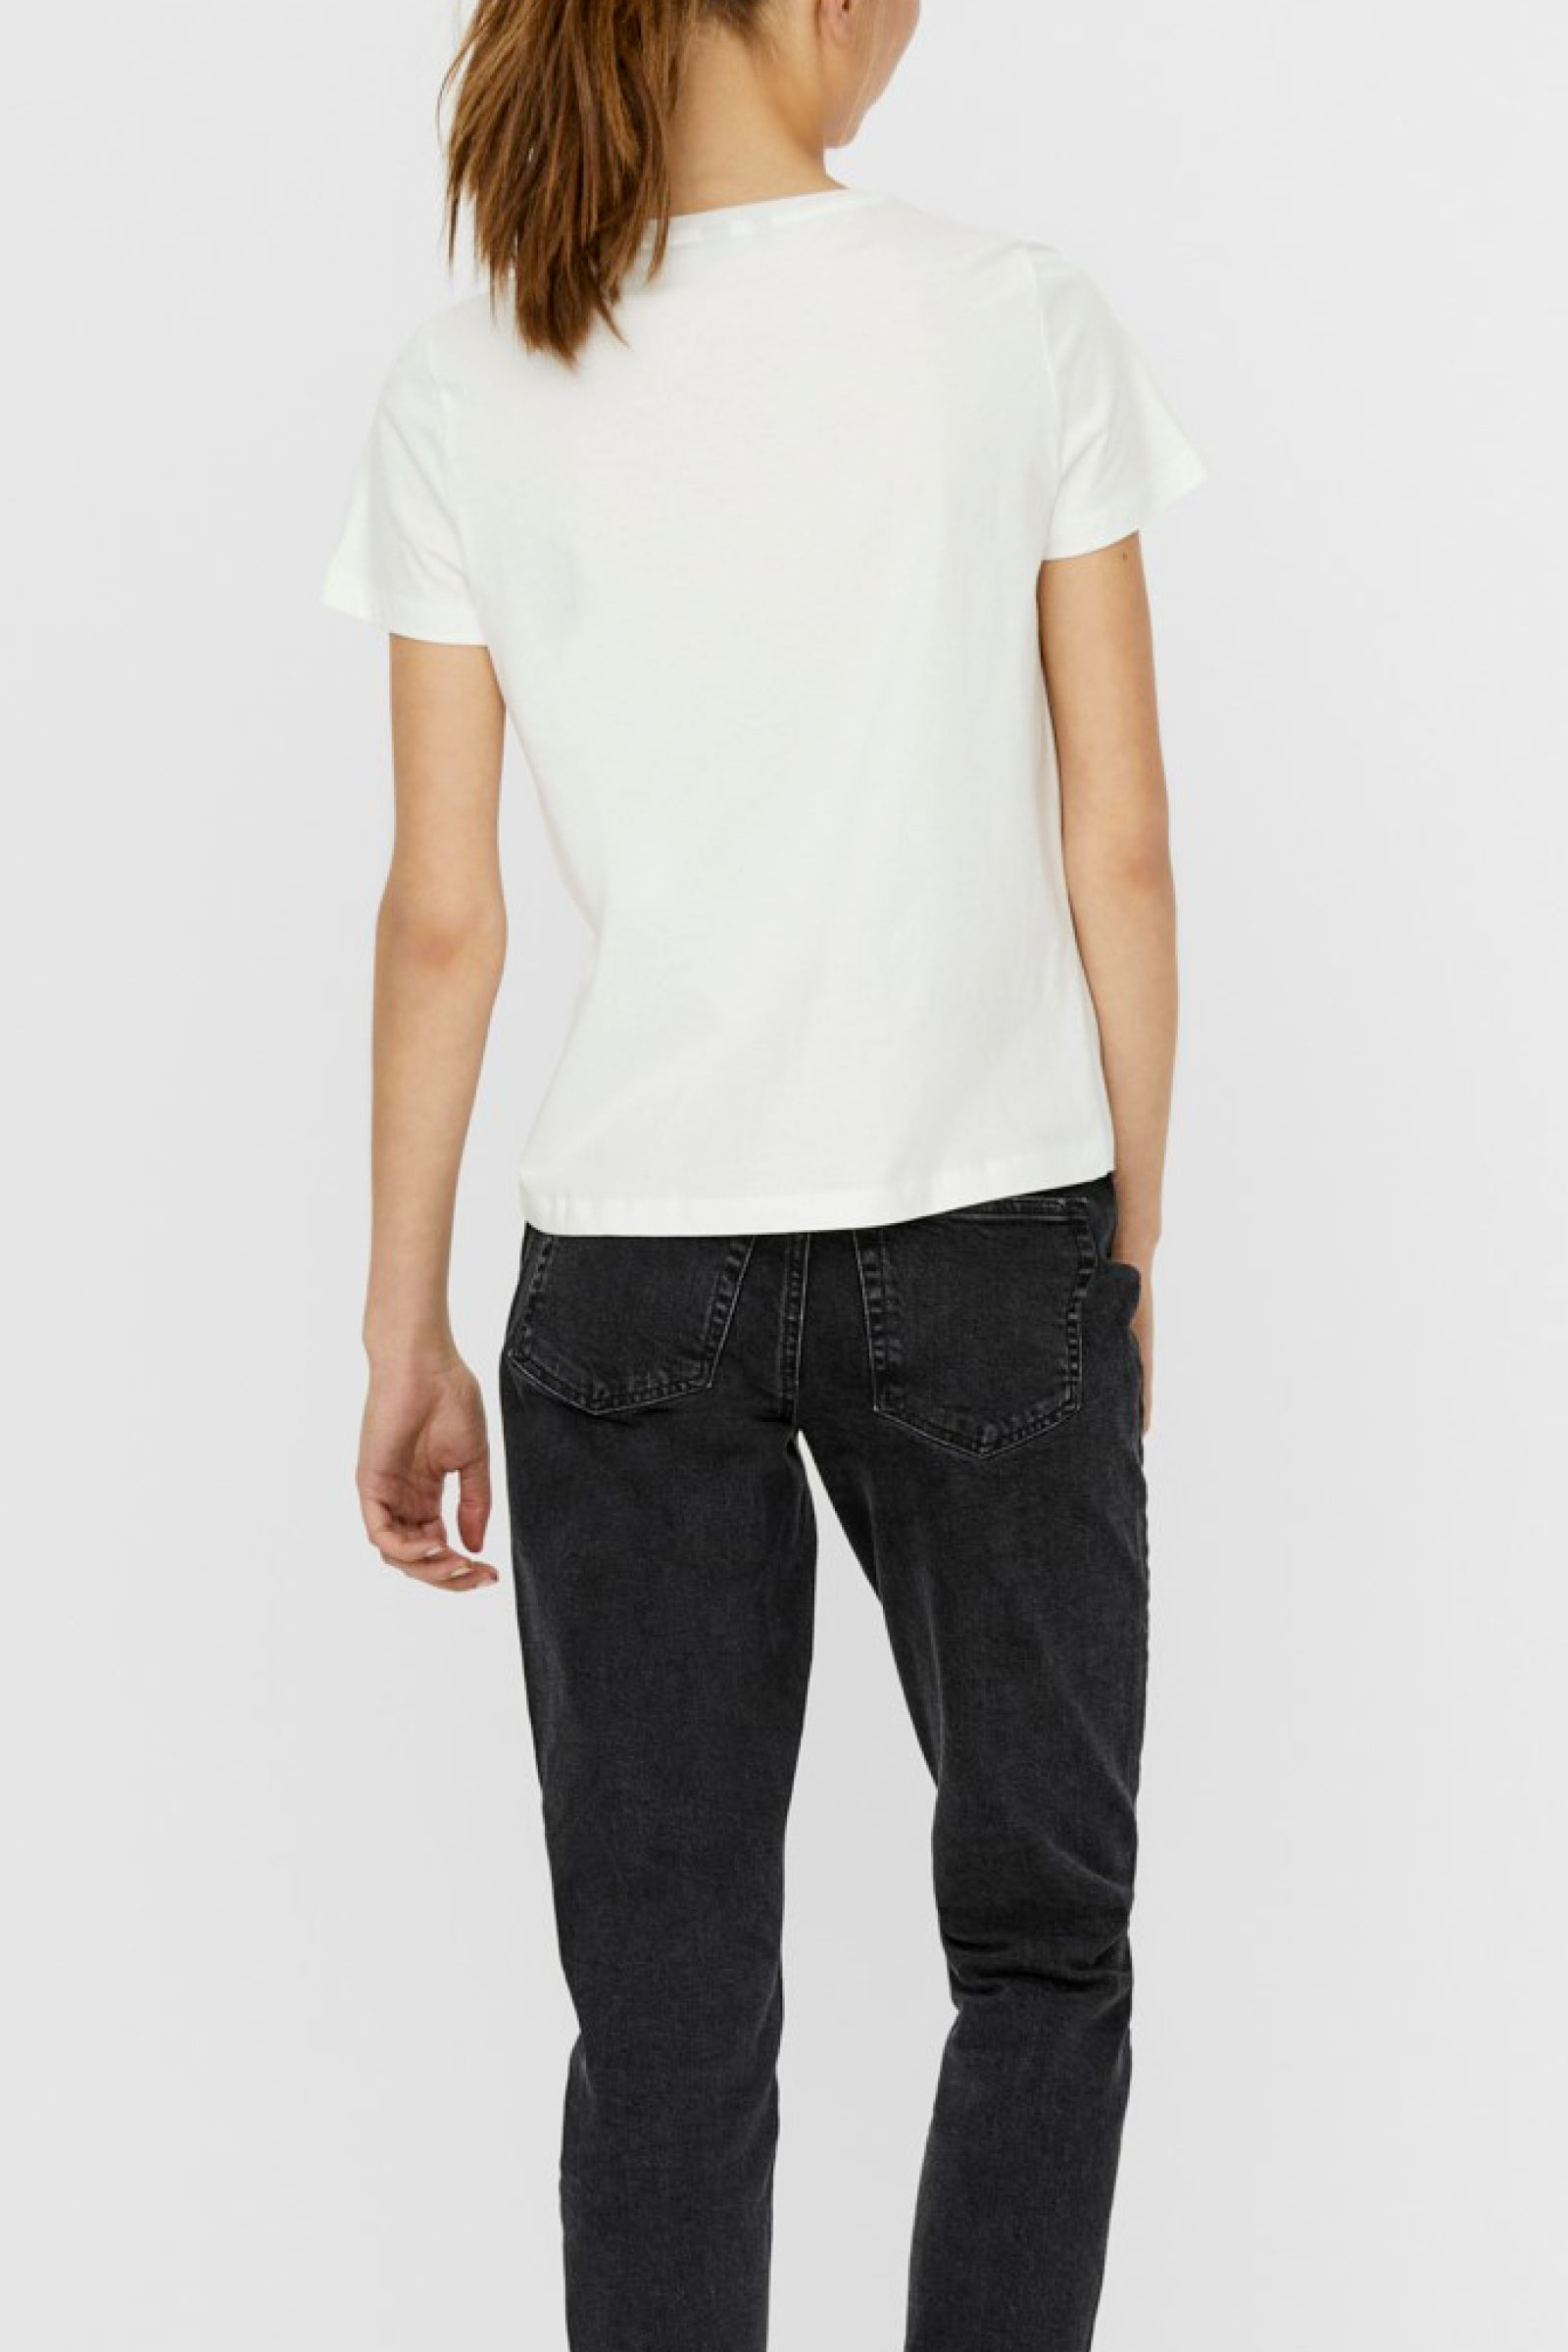 VERO MODA T-SHIRT Donna Modello CAMILLAFRANCIS VERO MODA | T-Shirt | 10243908Print-PERFECT